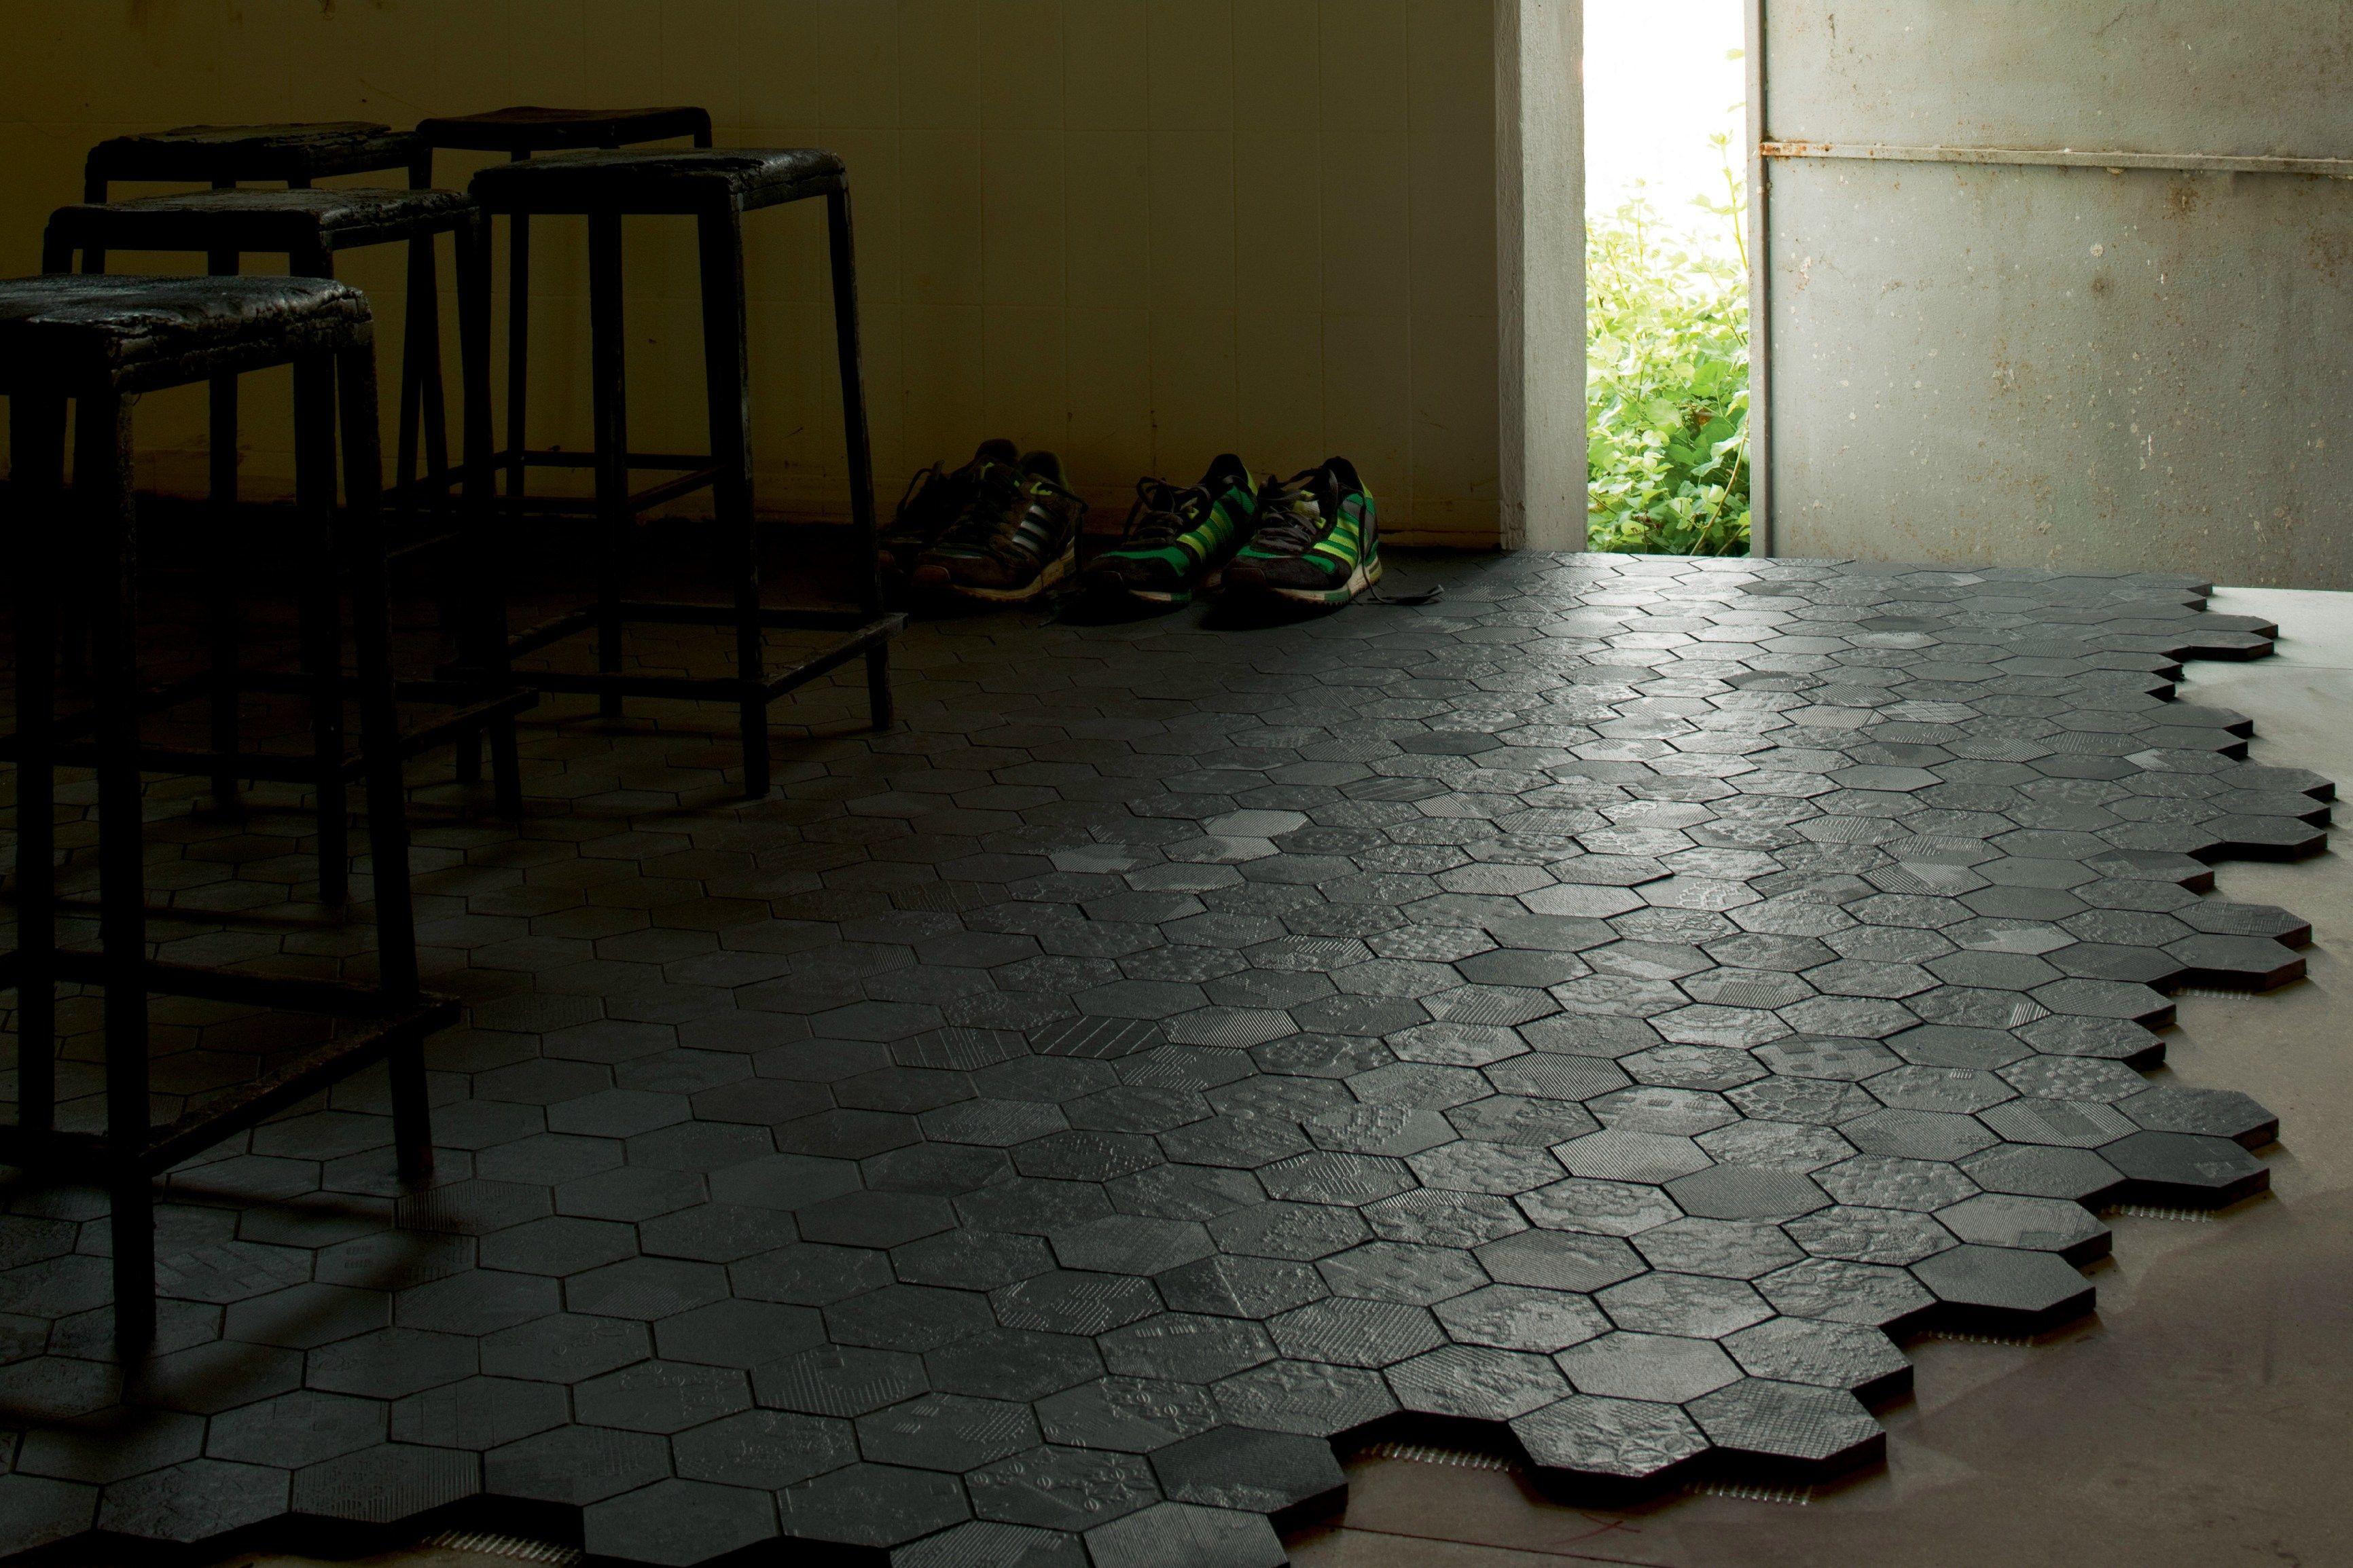 Indoor porcelain stoneware wall floor tiles dechirer decor for Carrelage 120x120